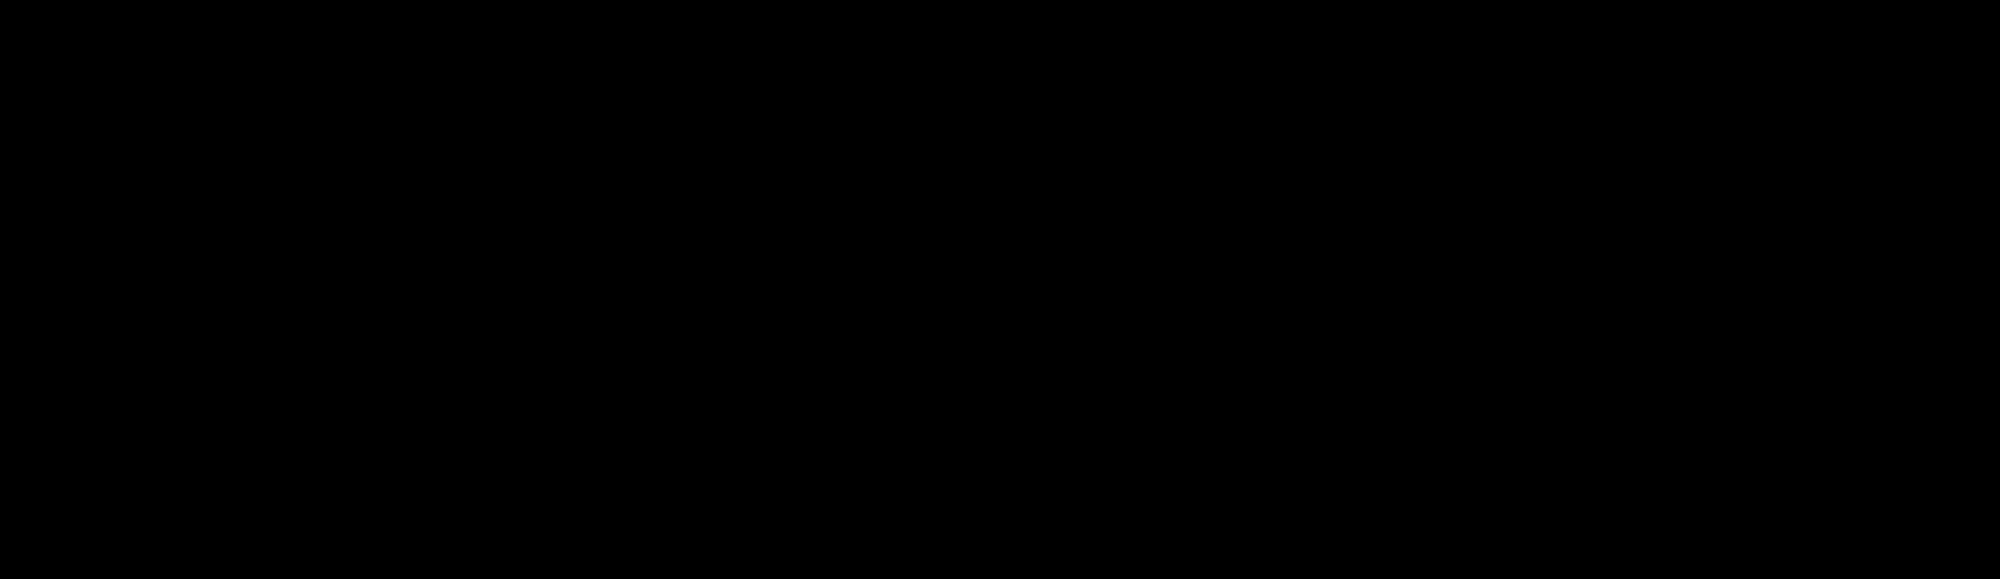 2000x579 Vector Sketching Bridge Transparent Png Clipart Free Download